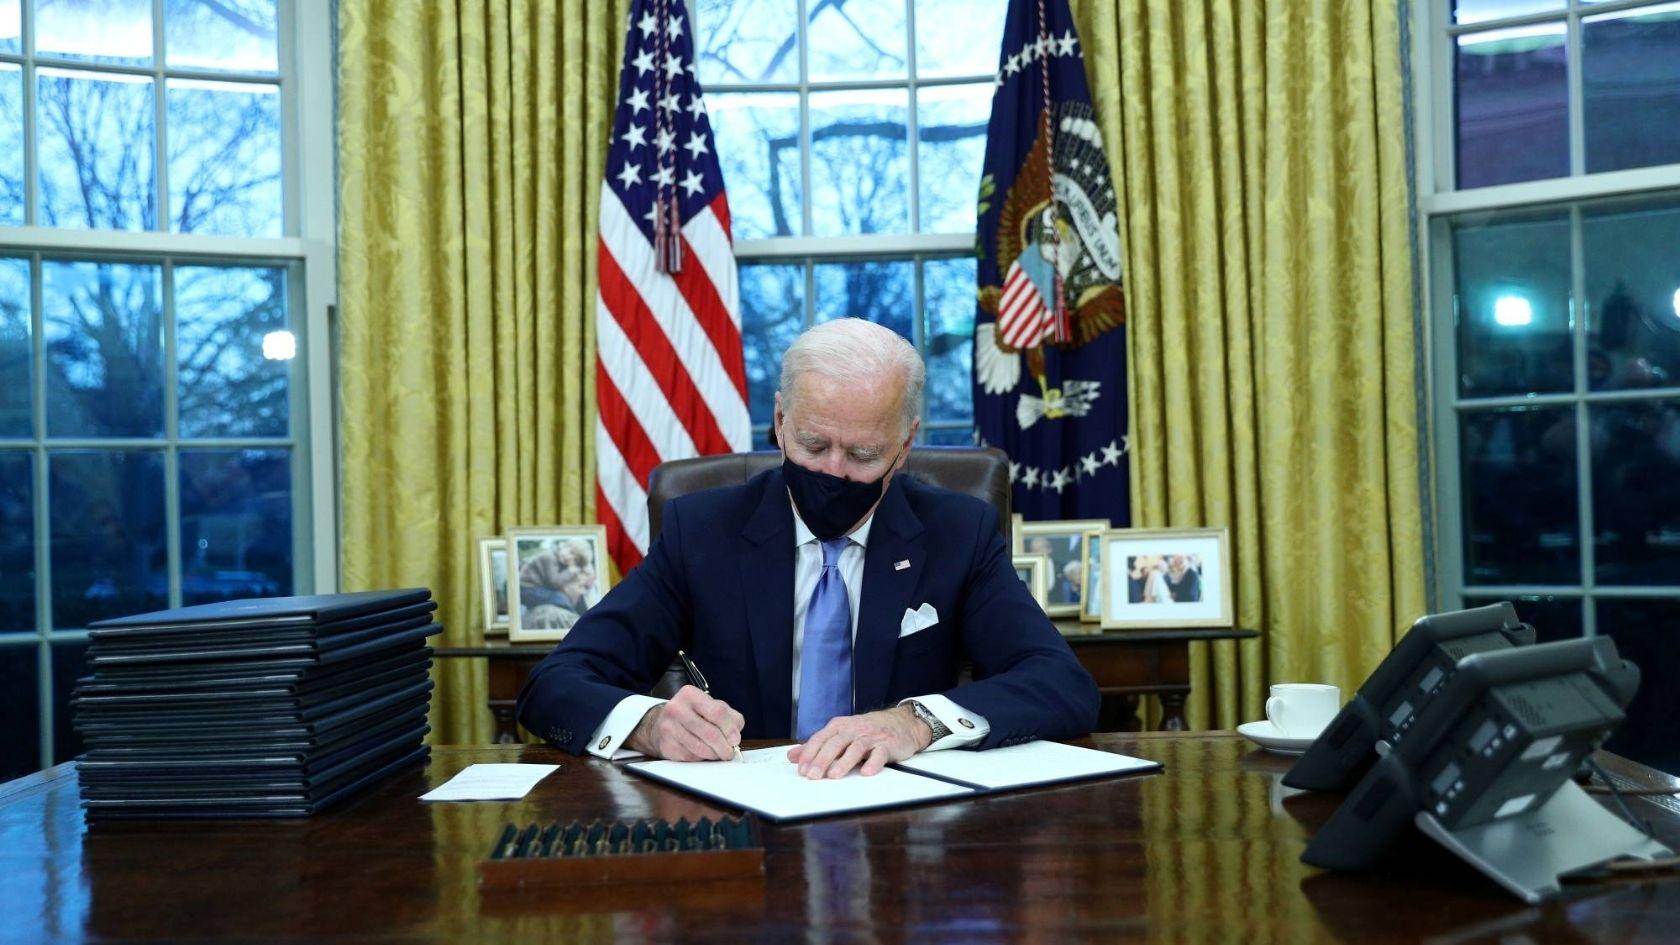 President Biden signs executive orders on Jan 21